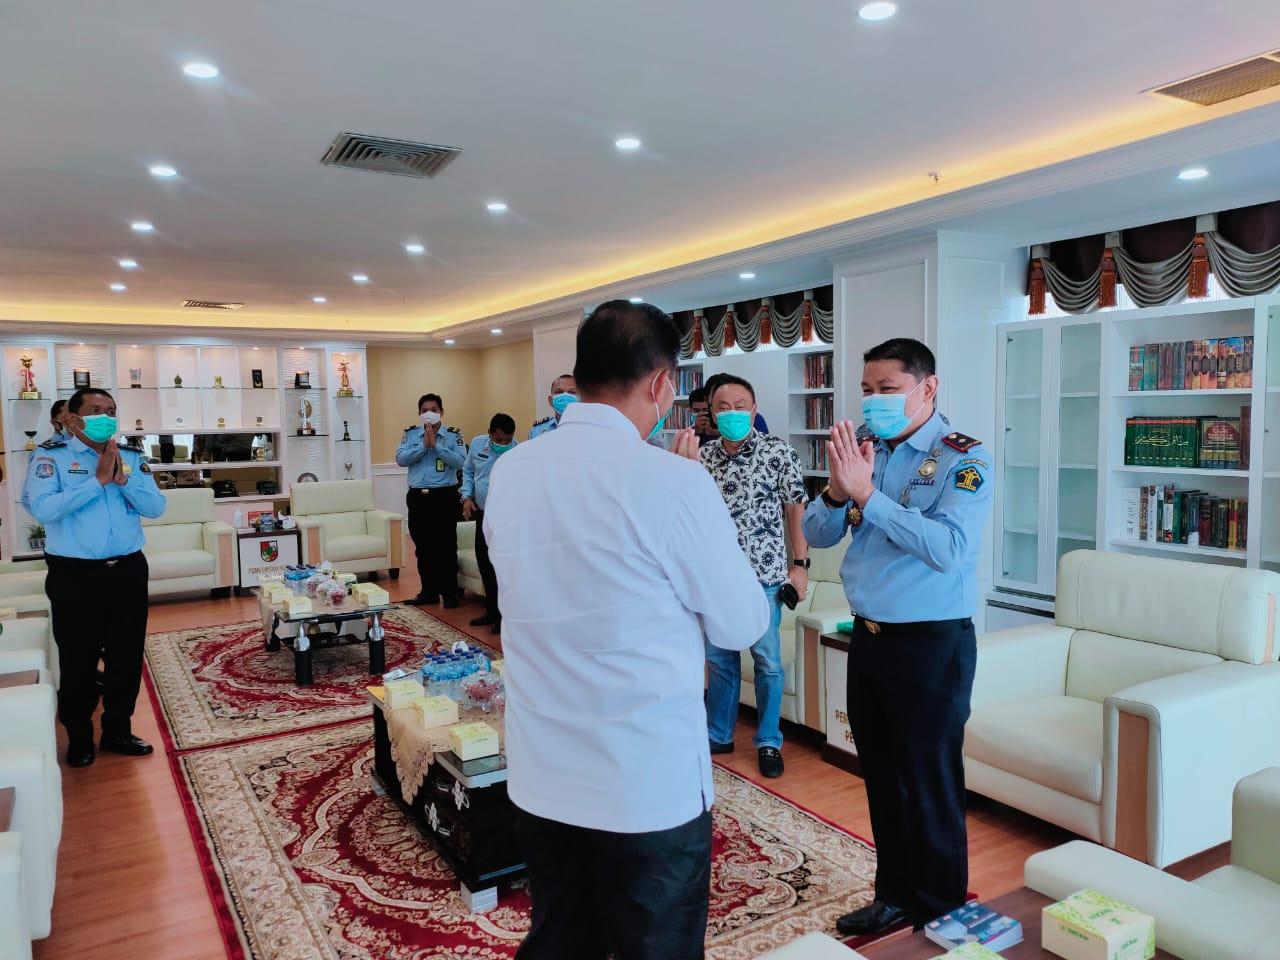 Walikota menyambut kedatangan Kepala Imigrasi Pekanbaru